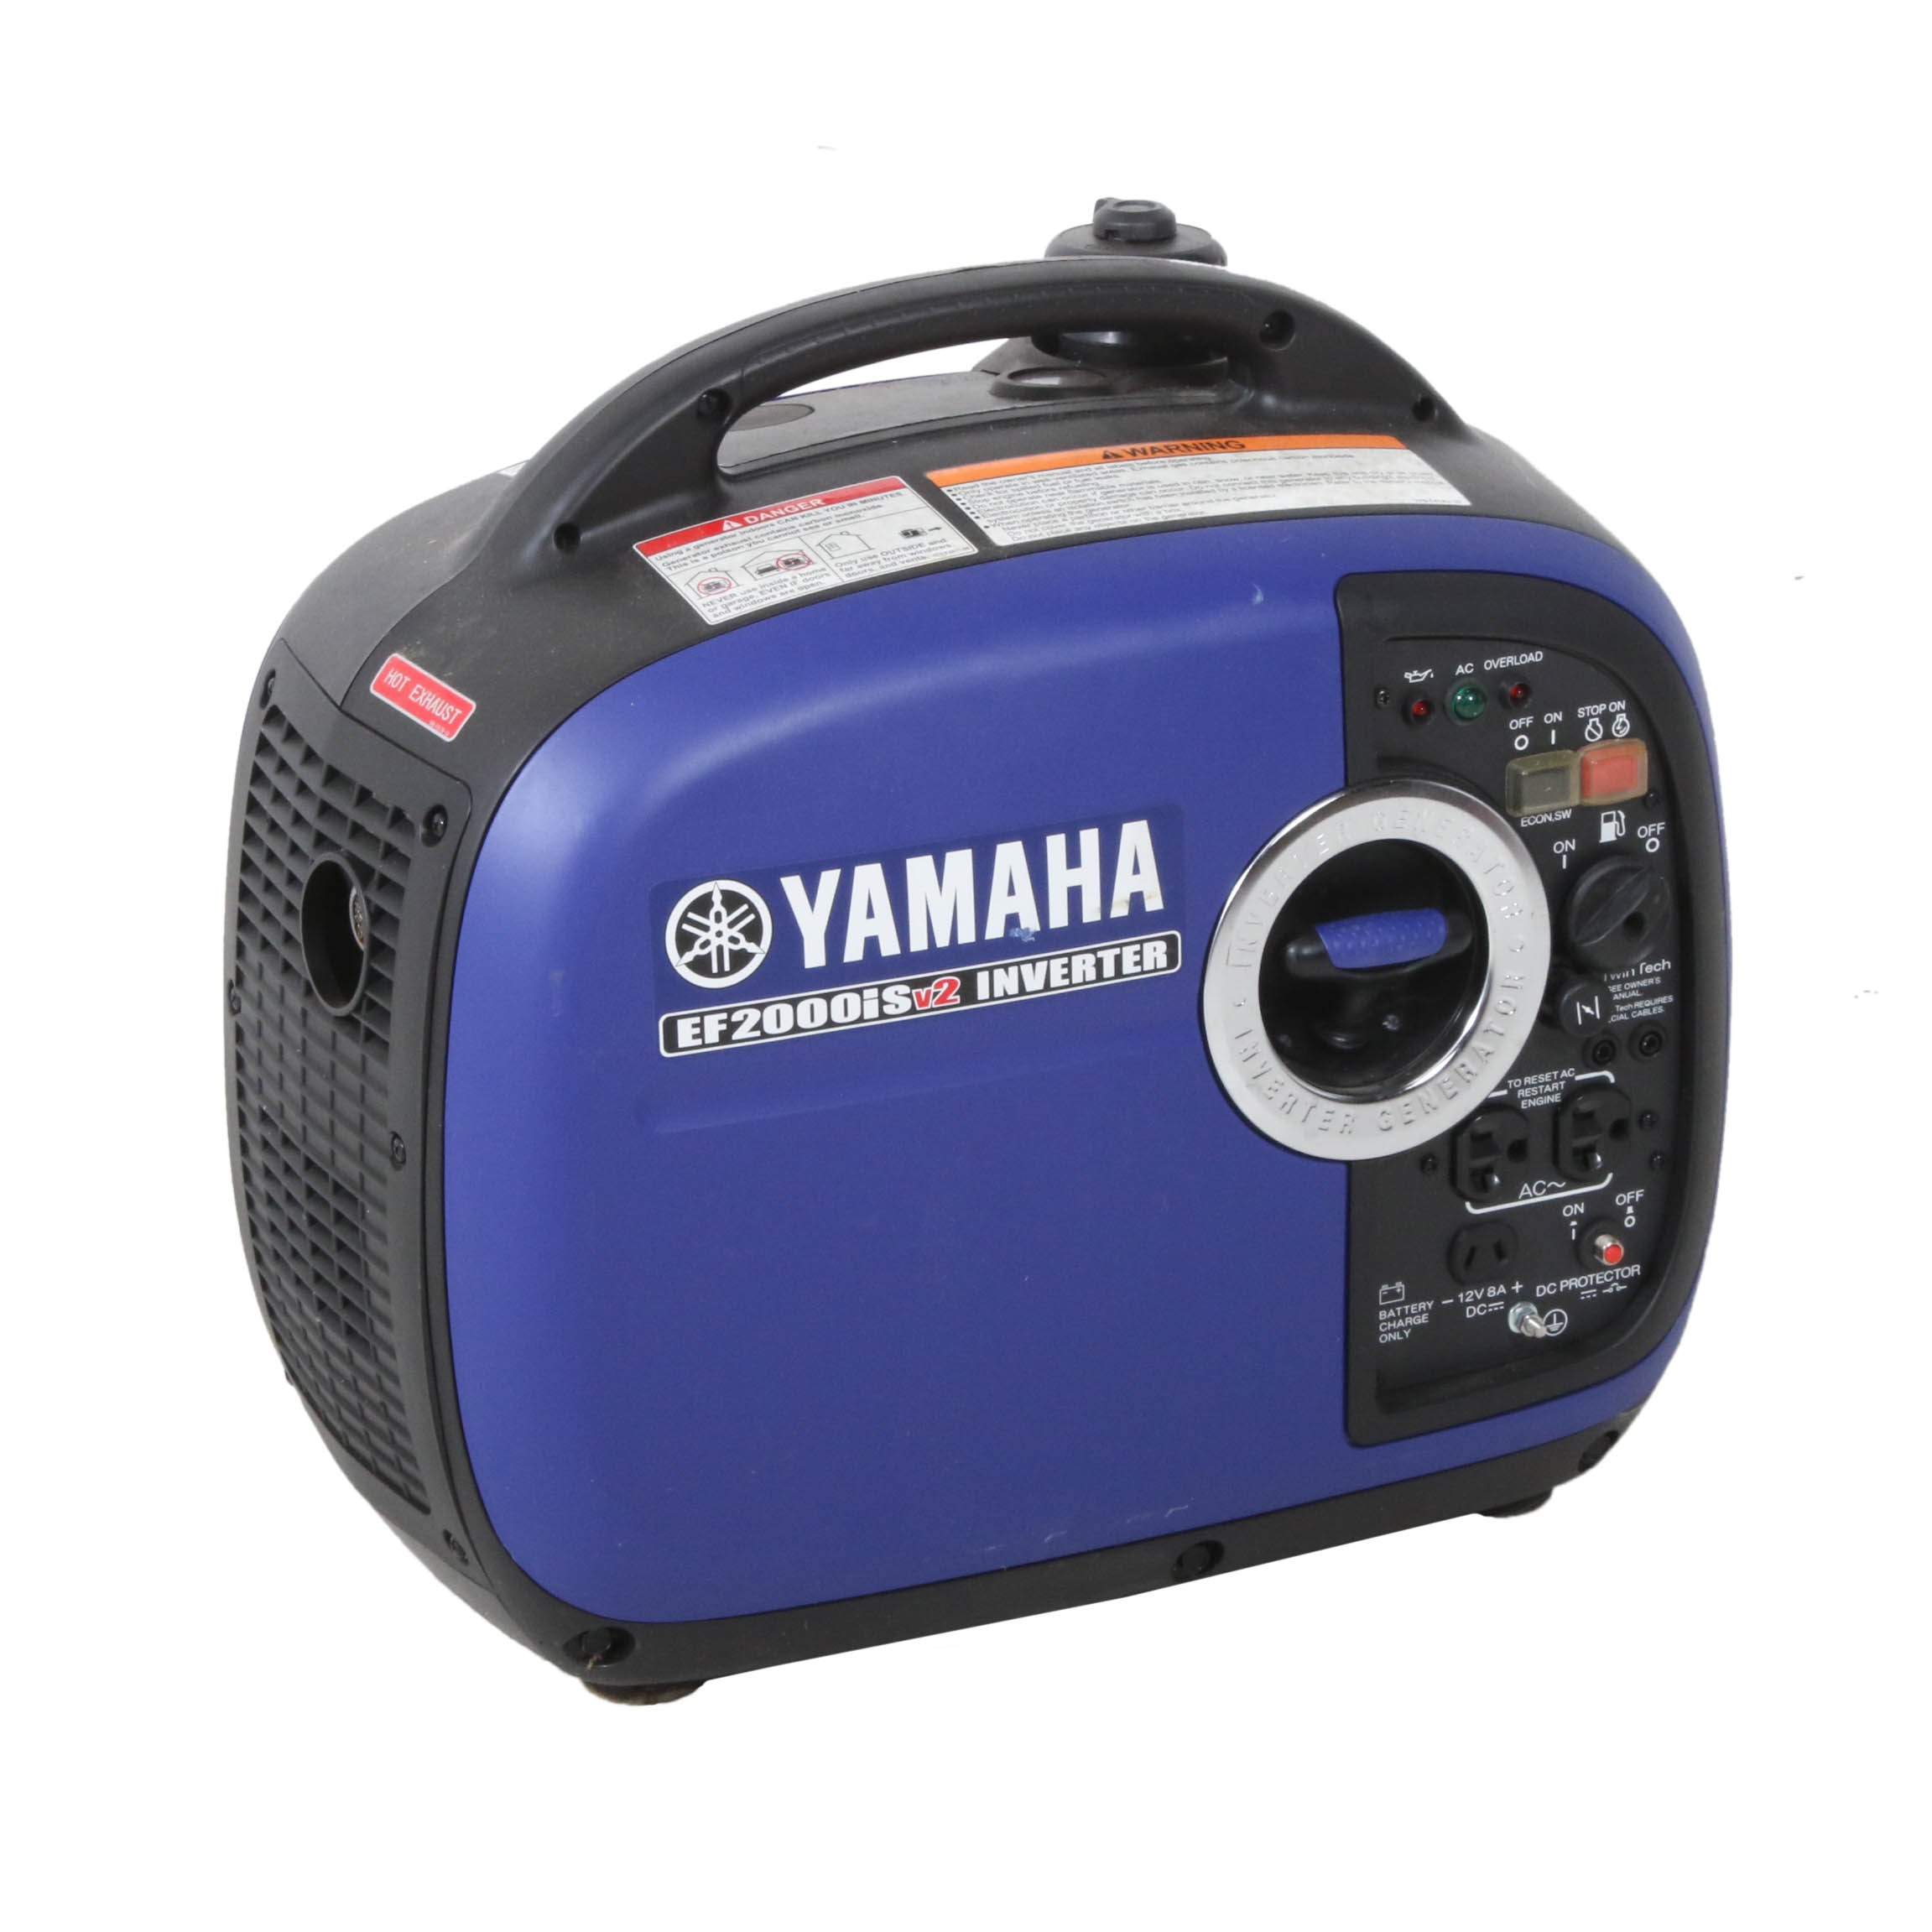 Yamaha VF2000iSv2 Inverter Generator